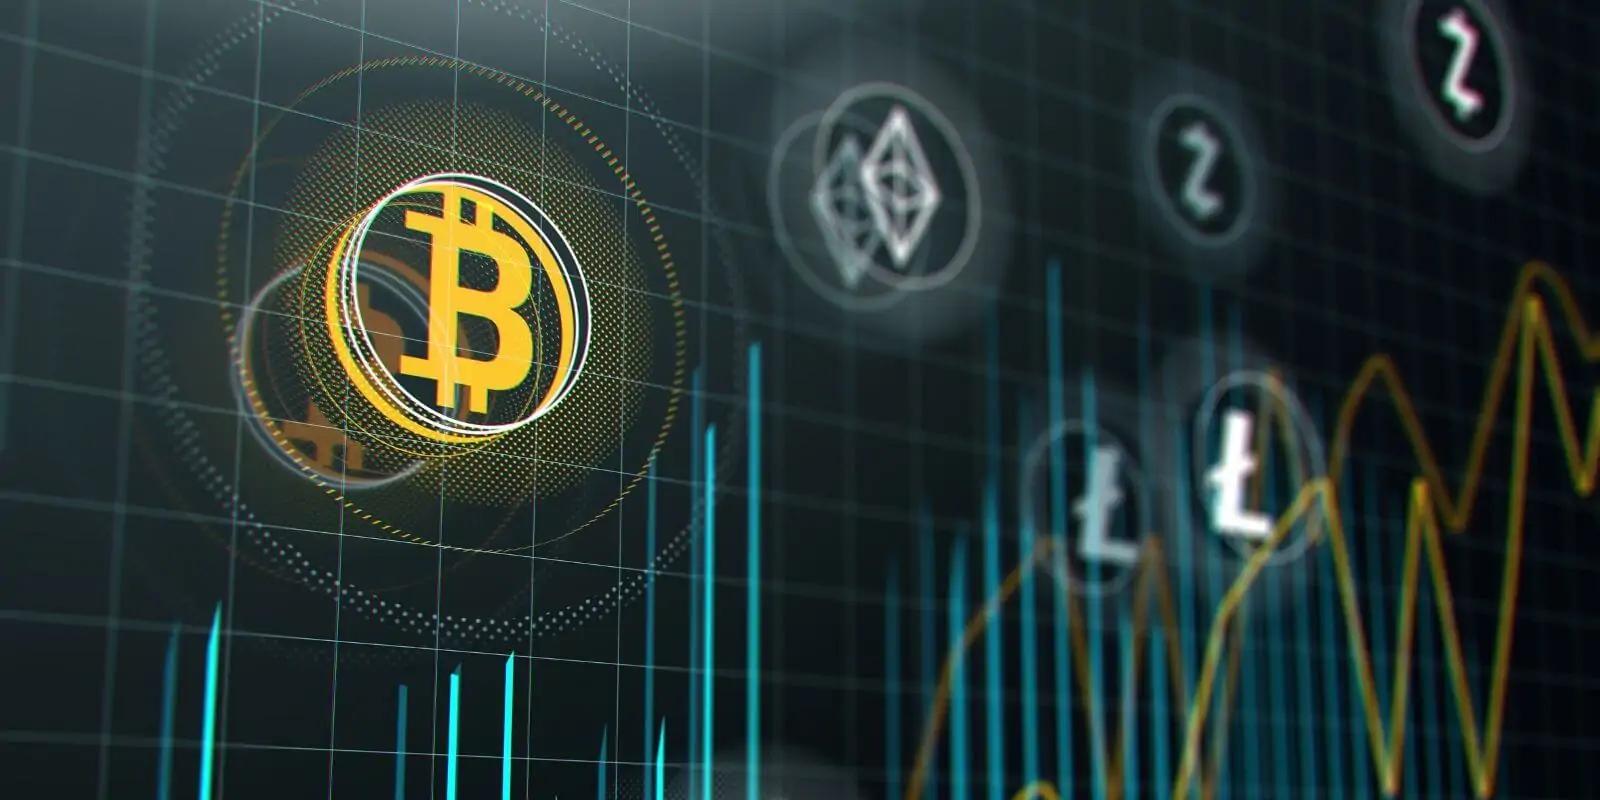 L'ironie du bitcoin - Notizia